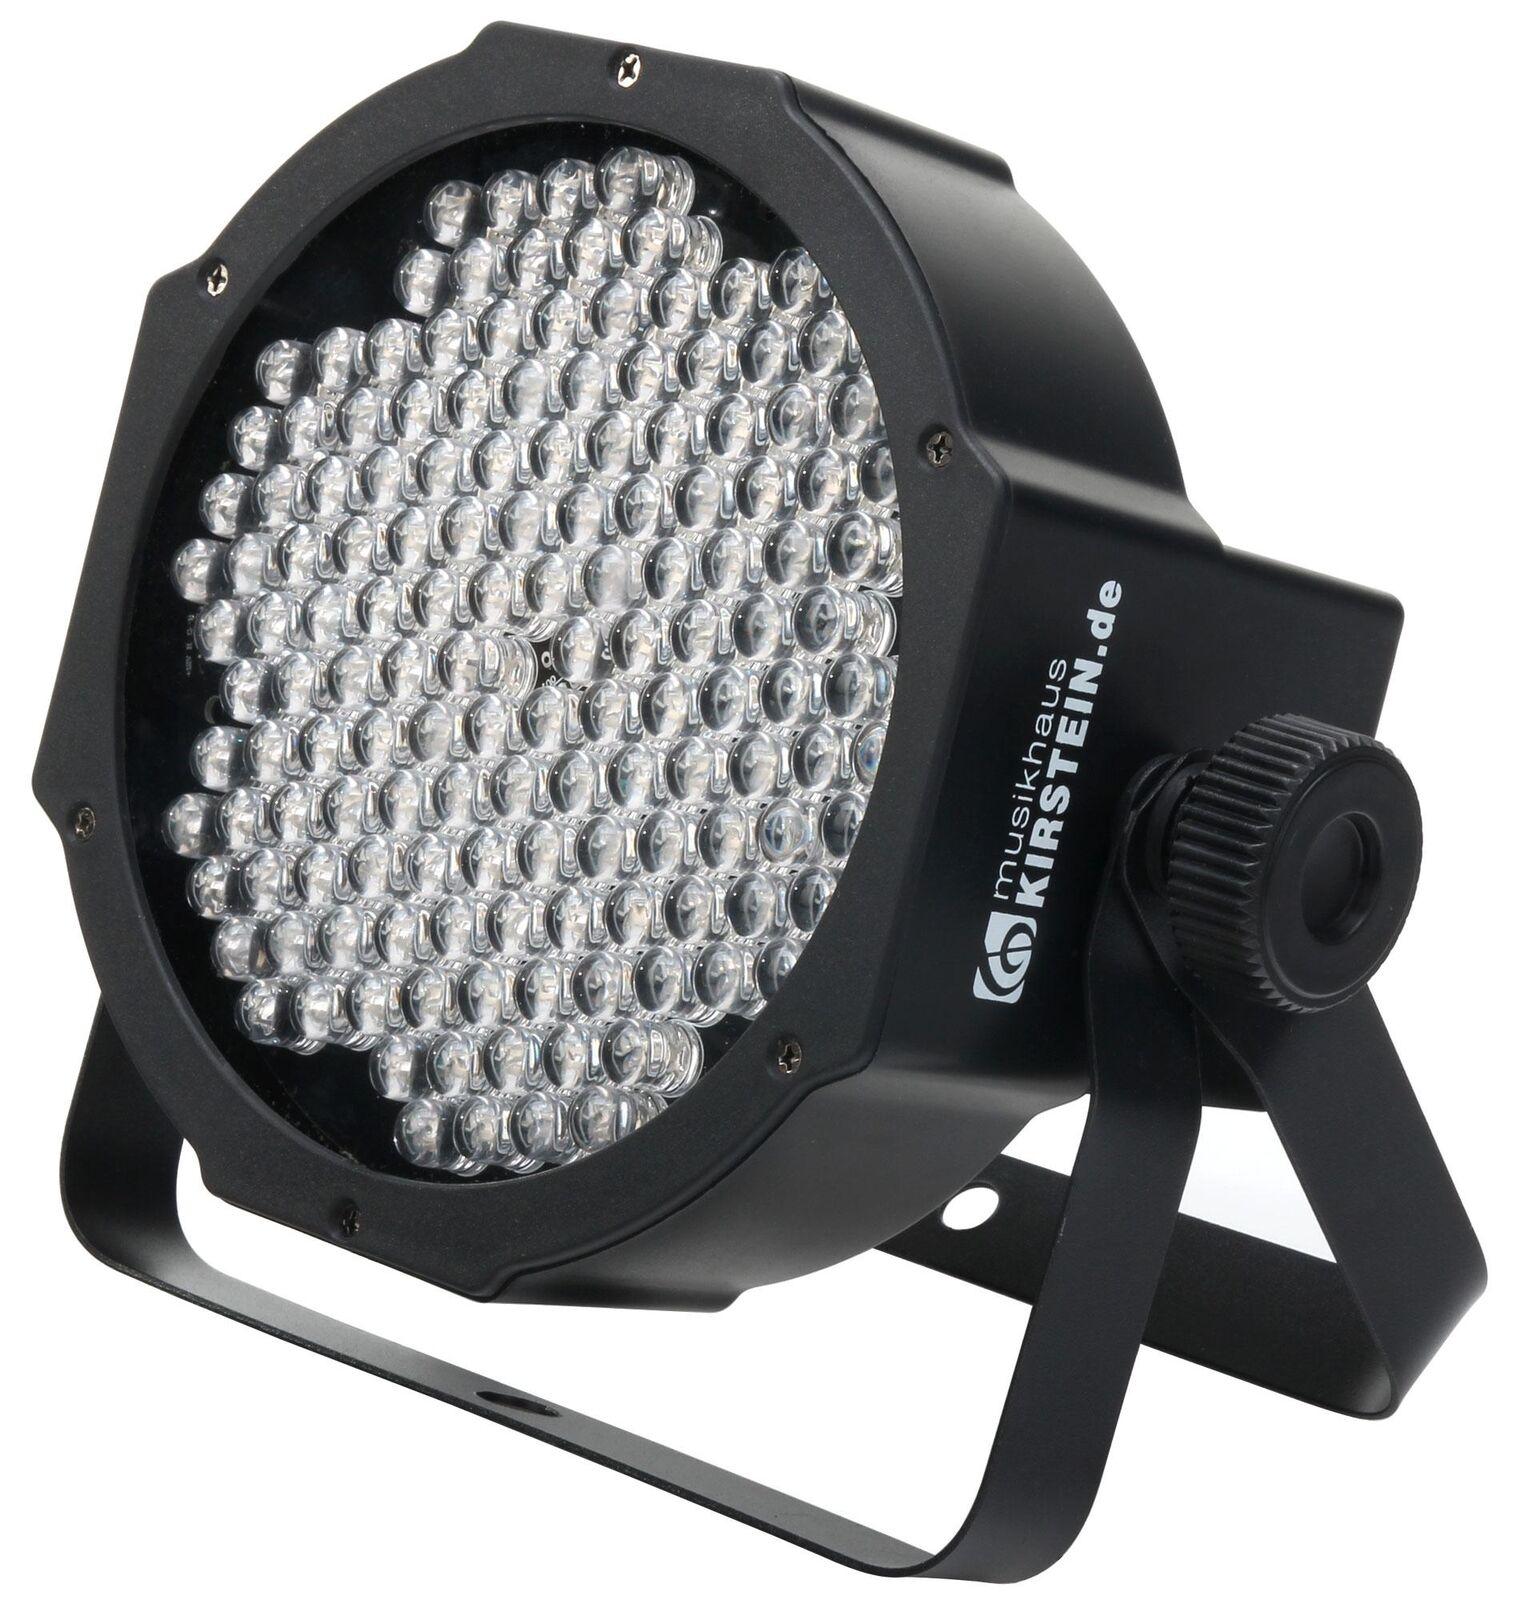 SHOWLITE DJ PA FLOODLIGHT 144 RGB LED LAMPE DMX LICHT EFFEKT STRAHLER PARTY SPOT